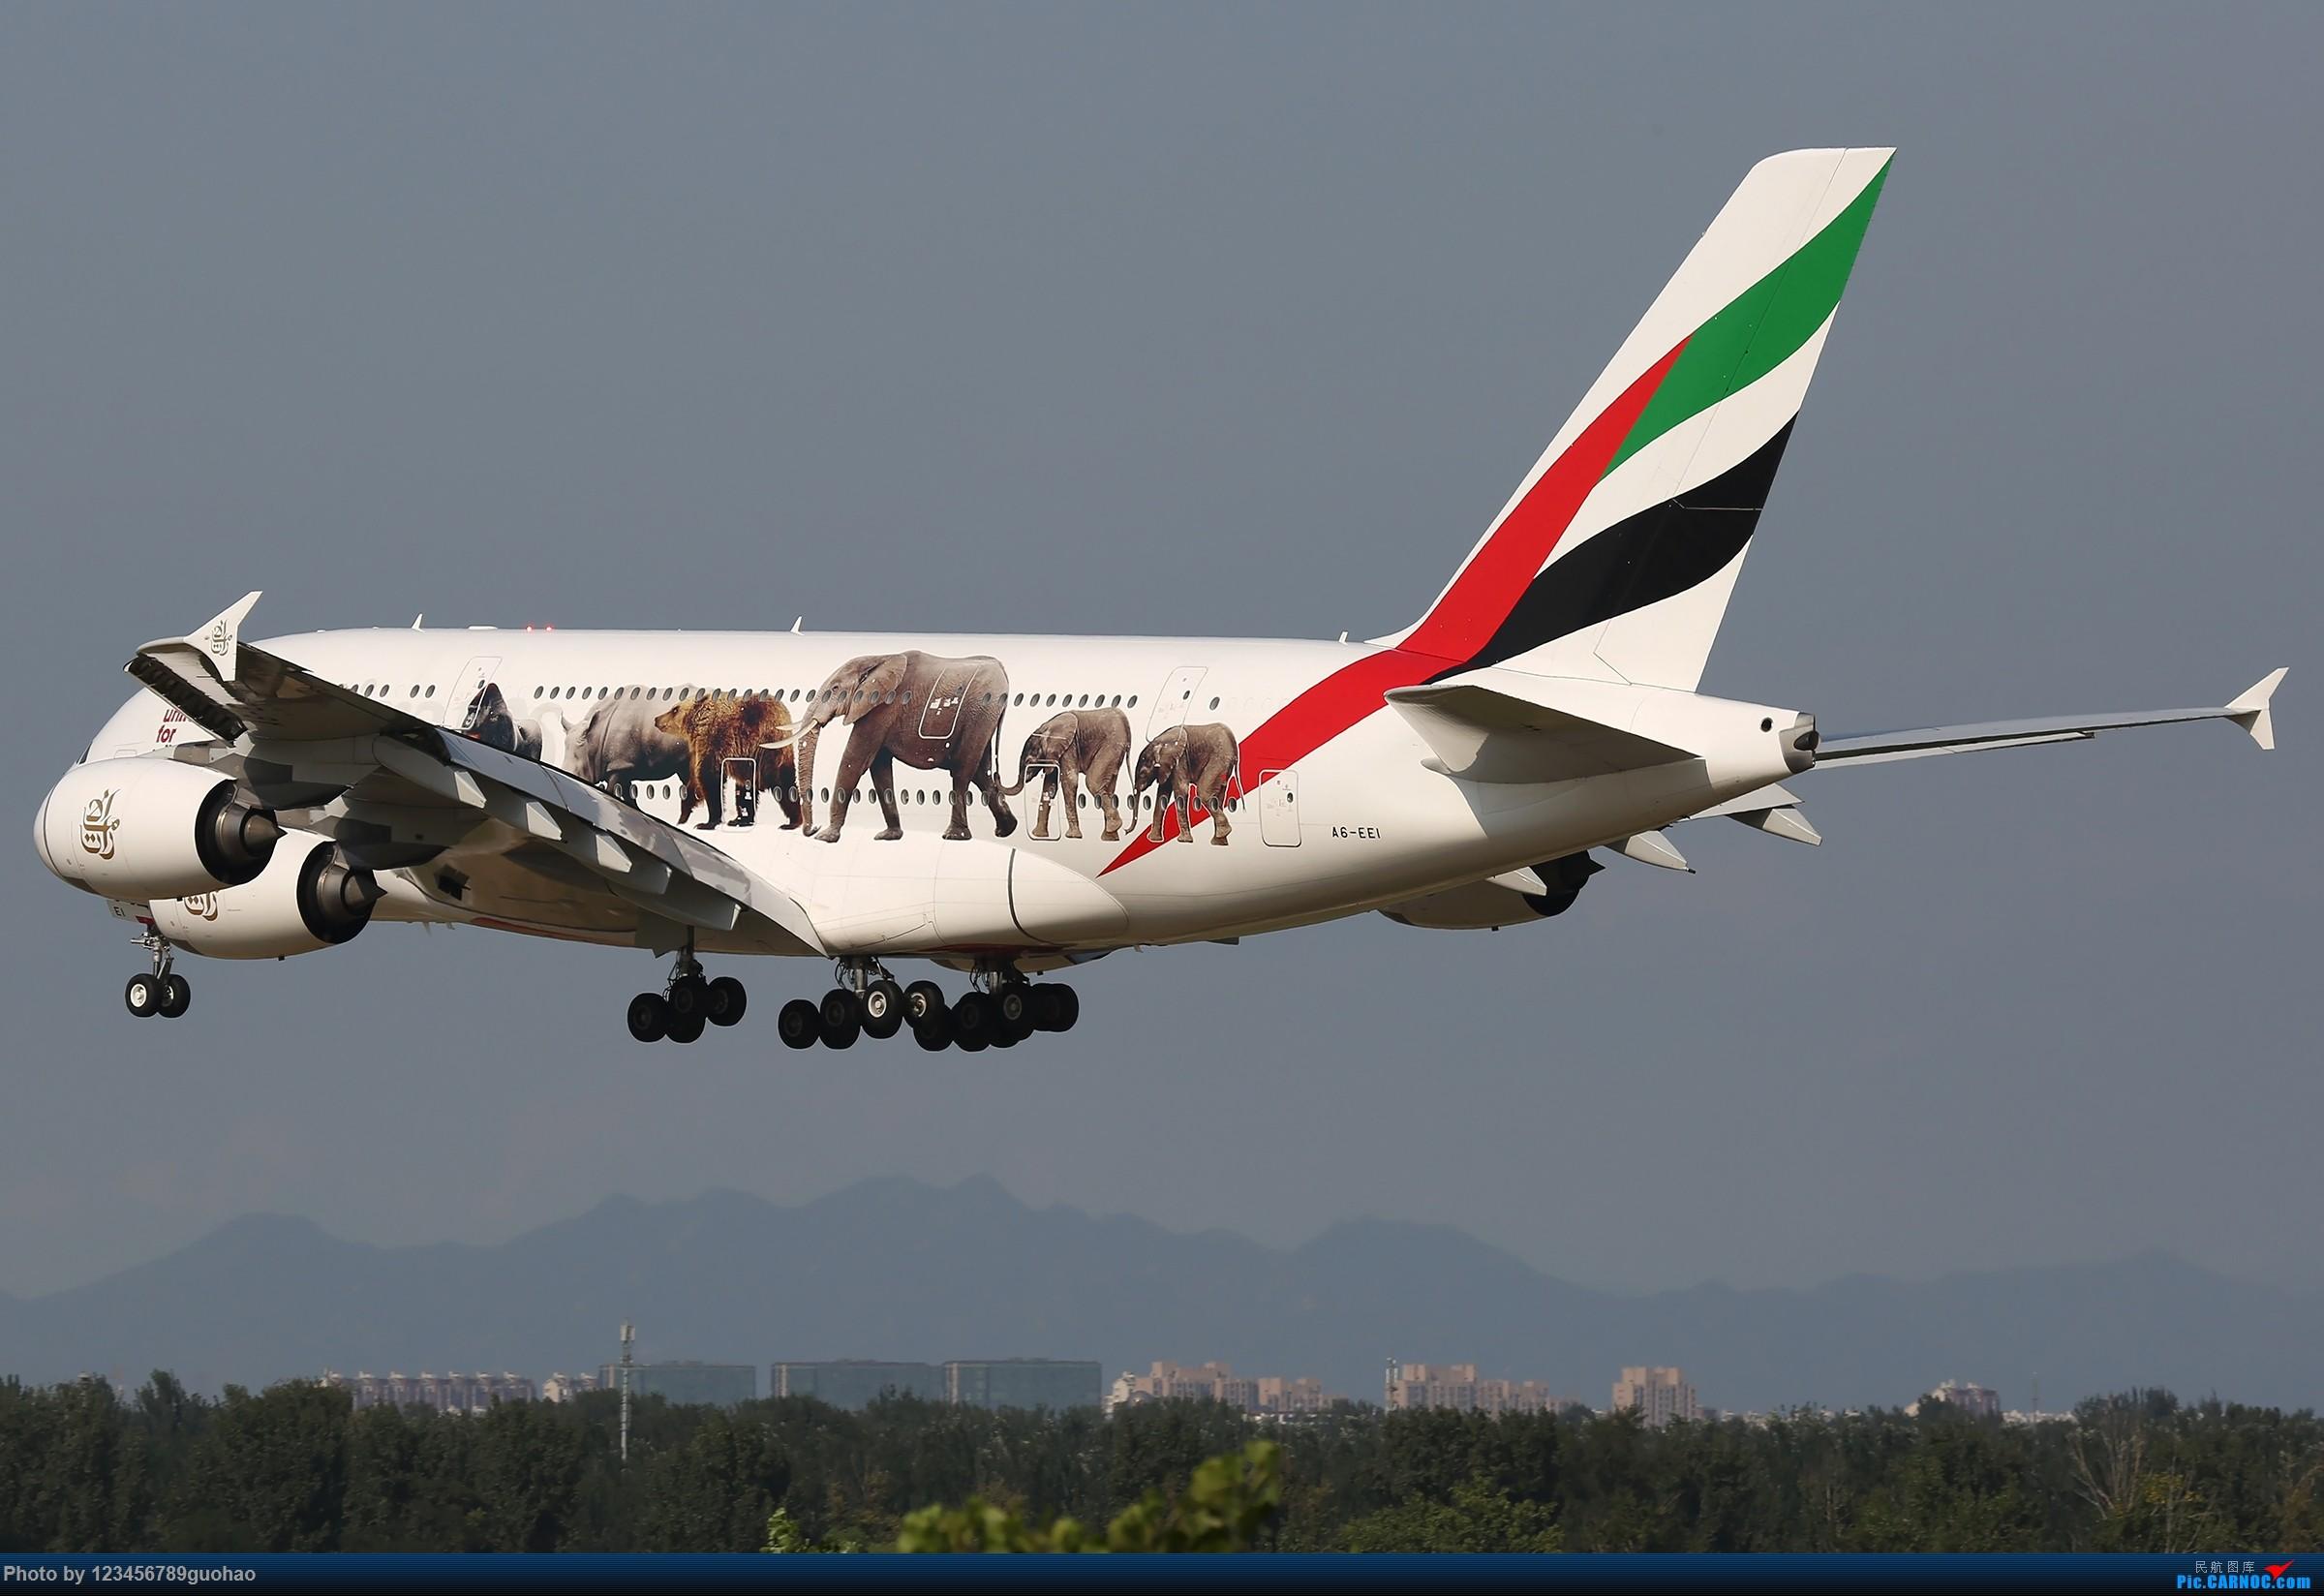 Re:请保护我们身边的野生动物 AIRBUS A380-800 A6-EEI 北京首都机场